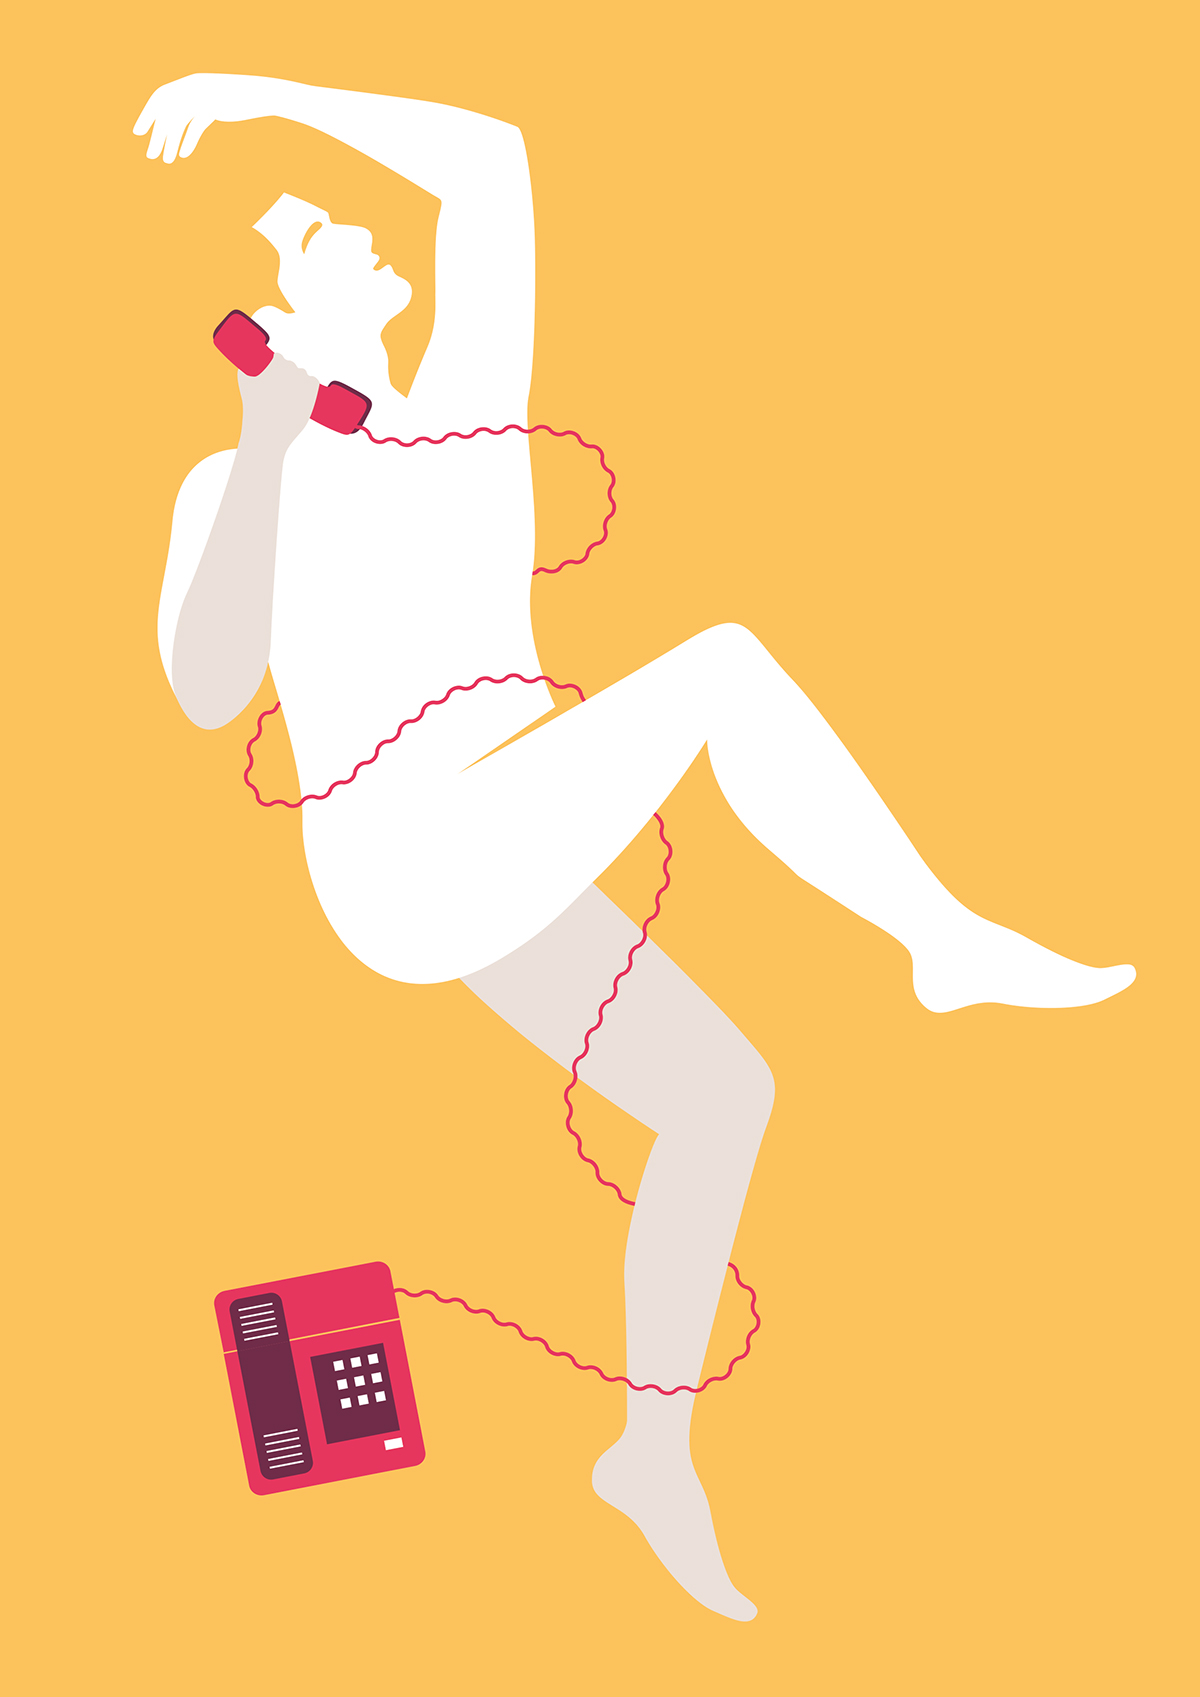 Pdo phone sex